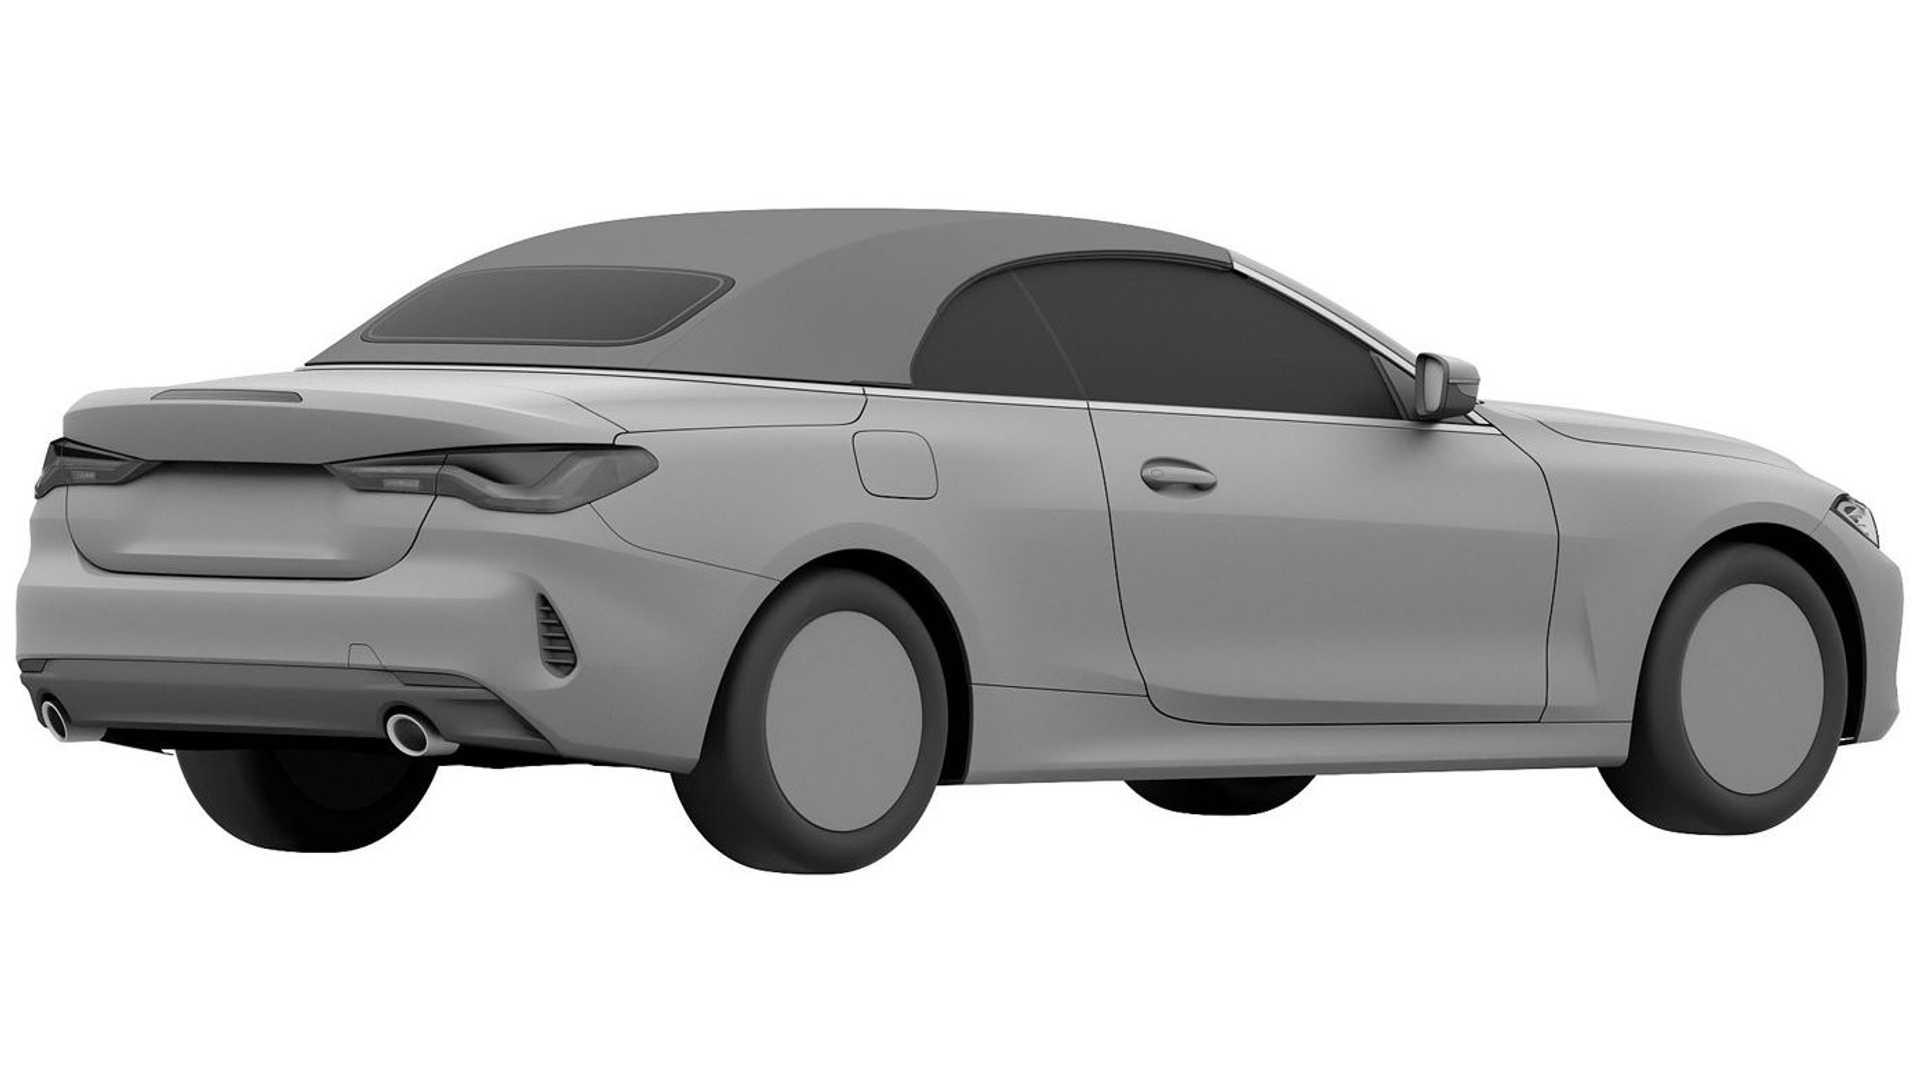 2022-bmw-4-series-convertible-patent (2)